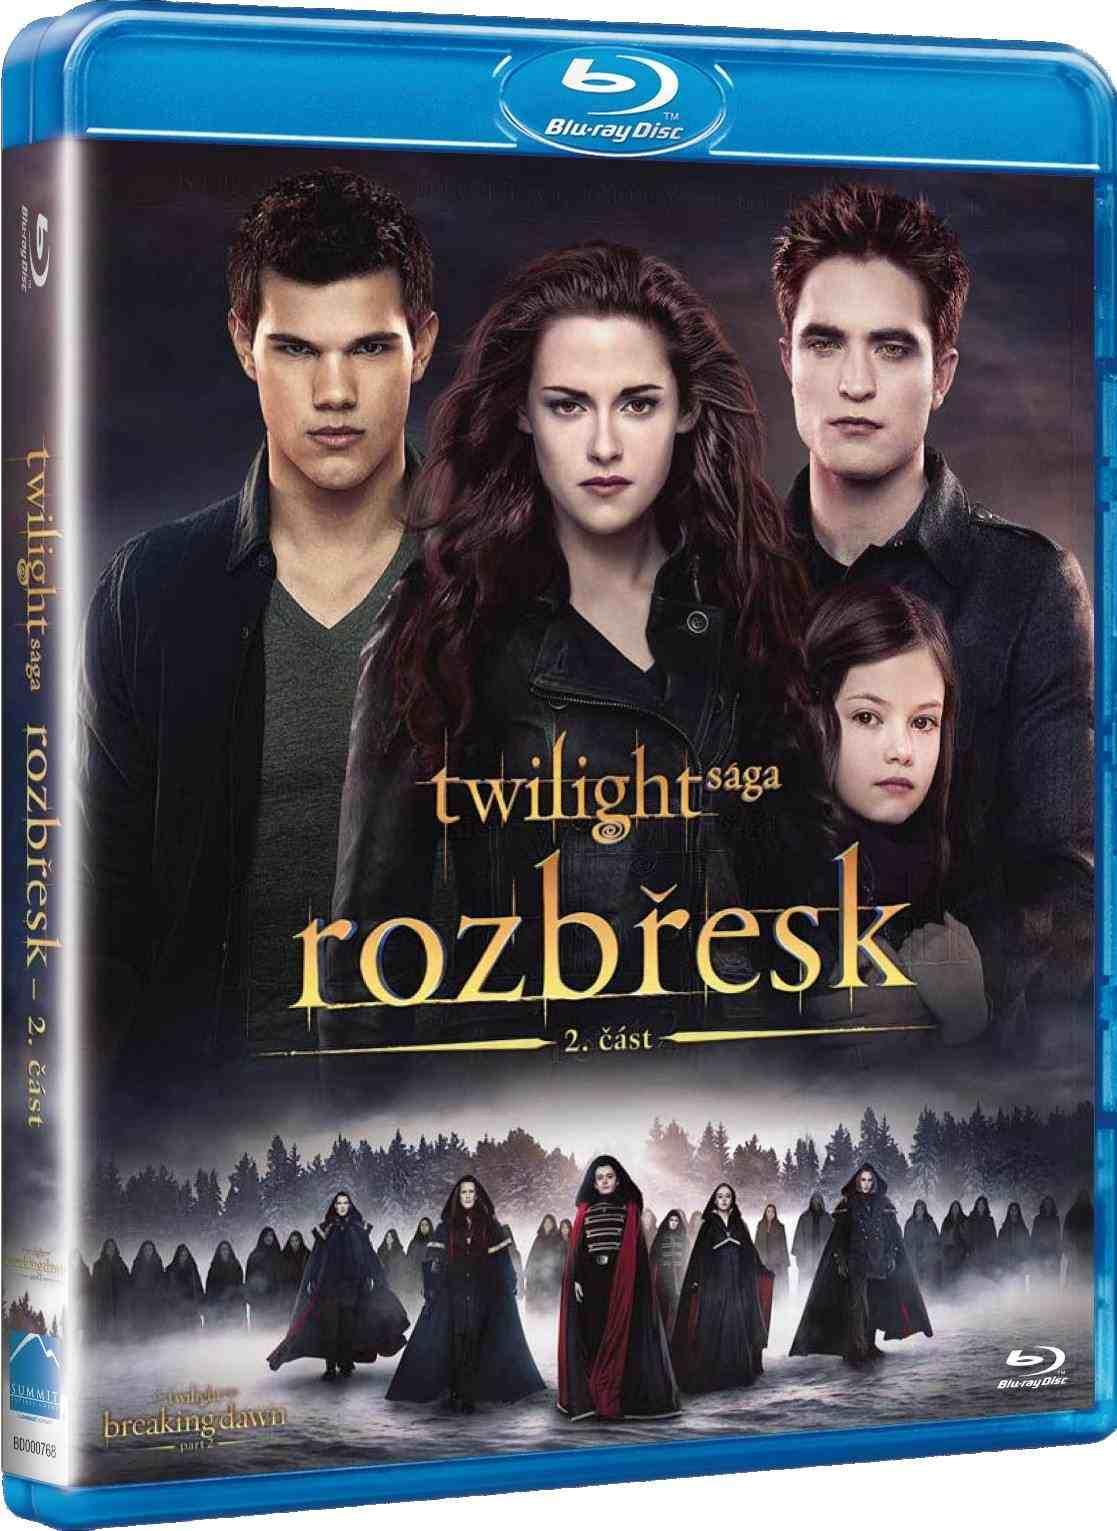 TWILIGHT SÁGA: ROZBŘESK - 2. ČÁST - Blu-ray